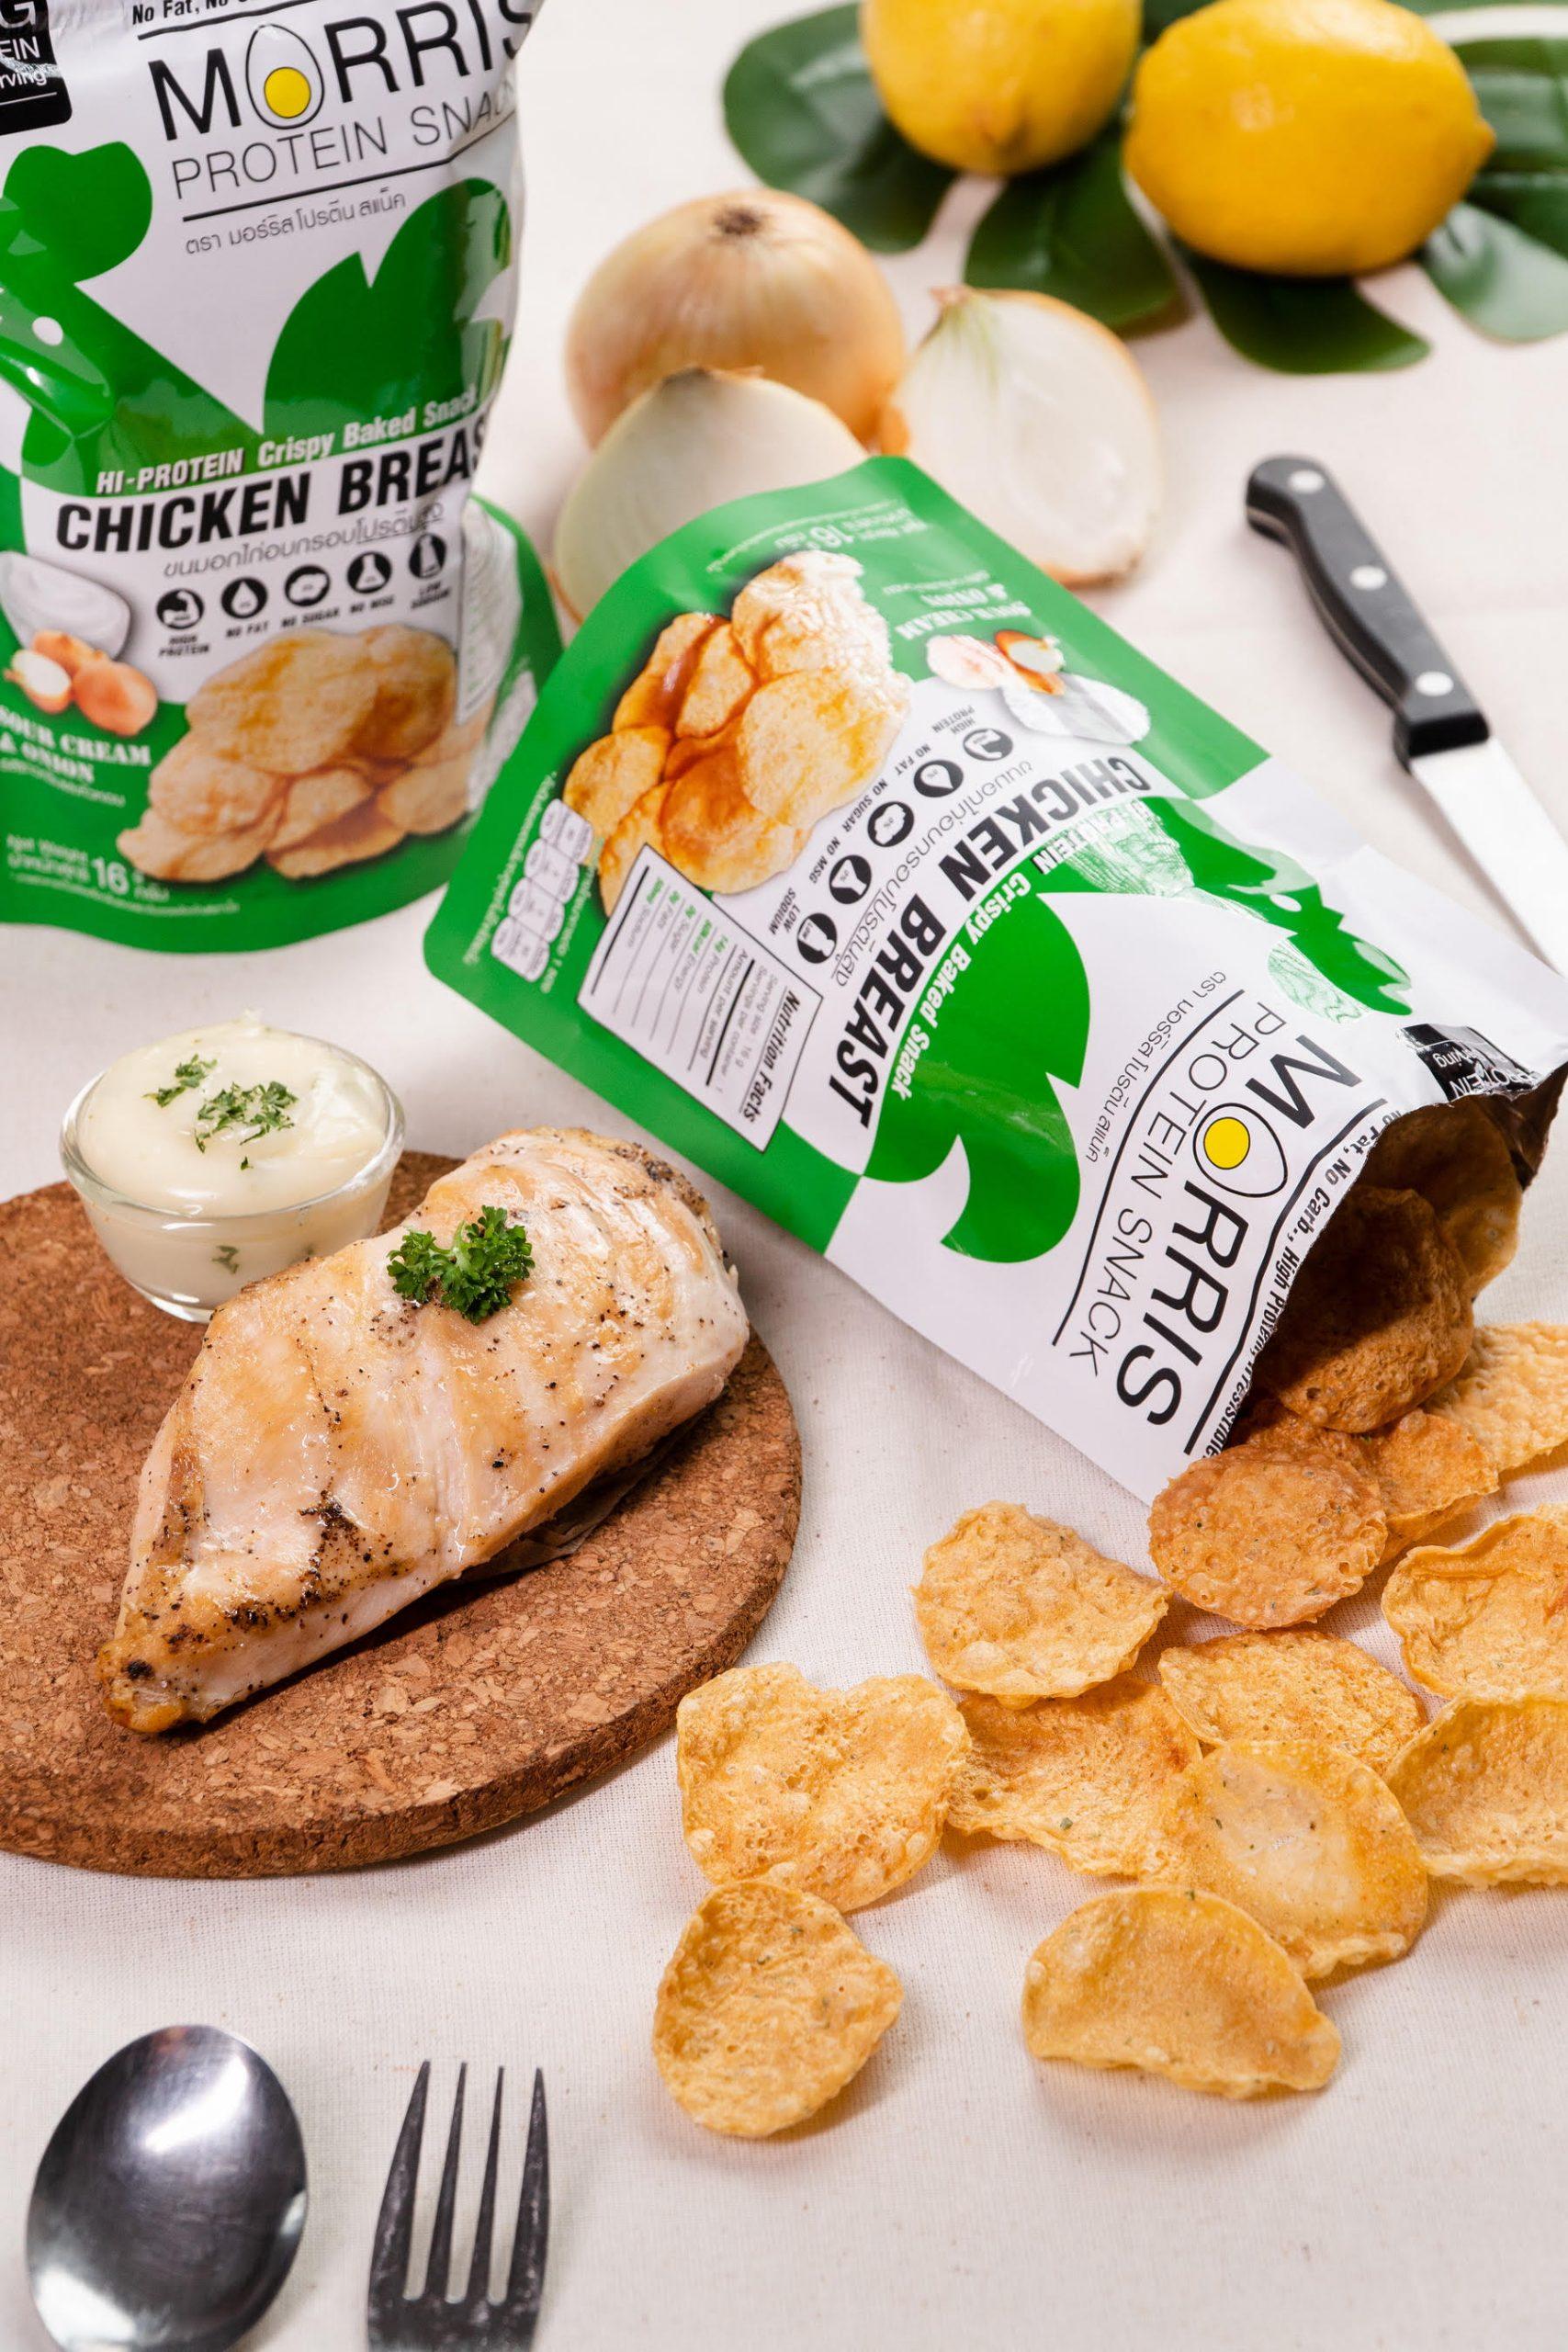 Morris Crispy Chicken Breast - Sour cream and onion 16g